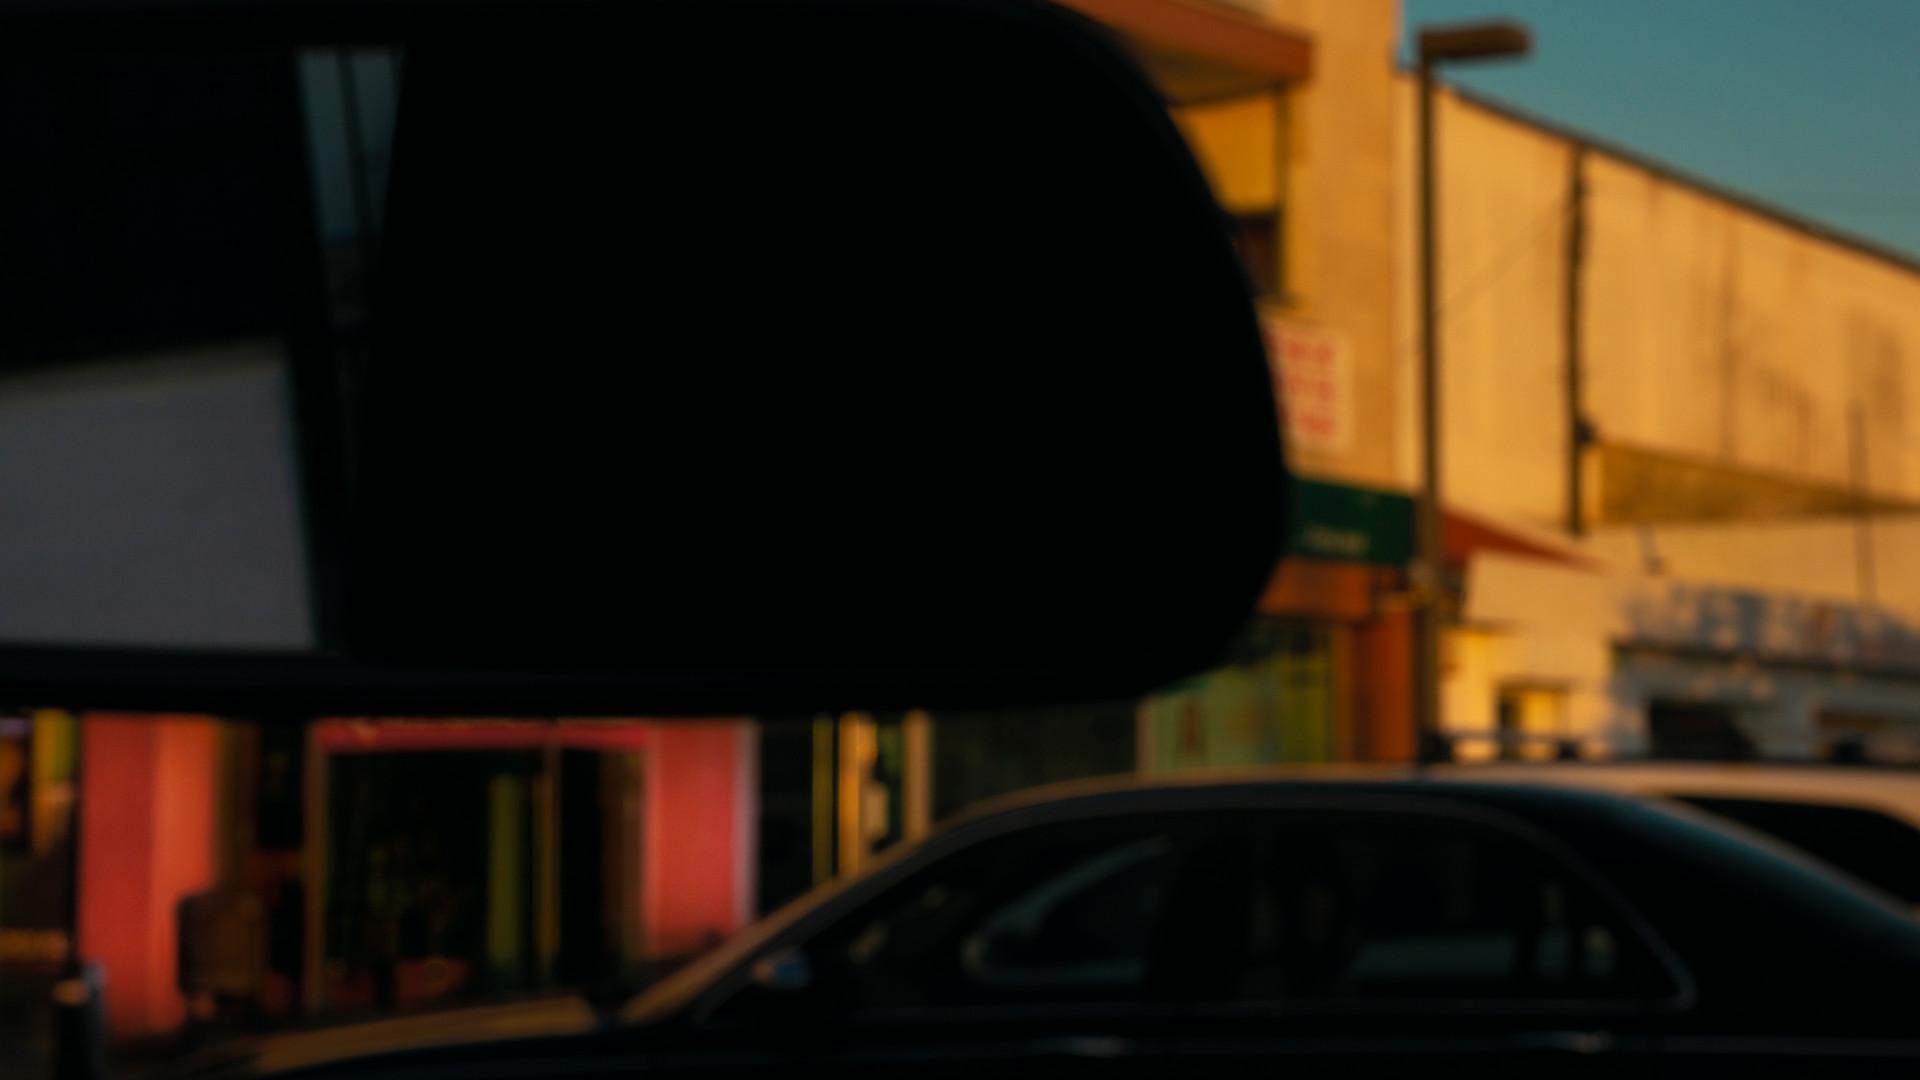 'TaxiWars' 2015, Alfarim, Portugal